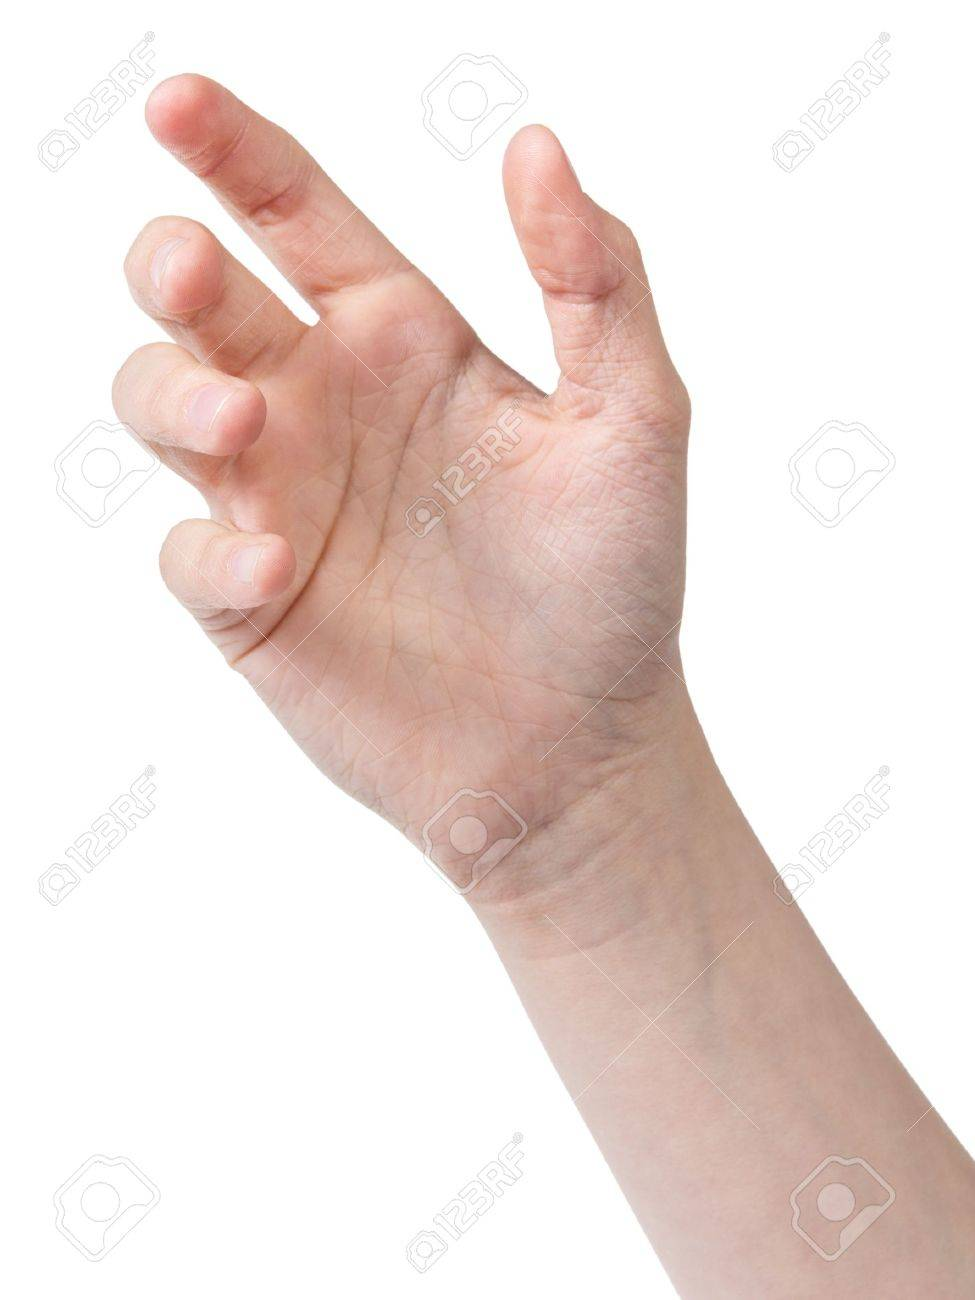 female teen hand to hold something like phone, isolated on white - 19023396